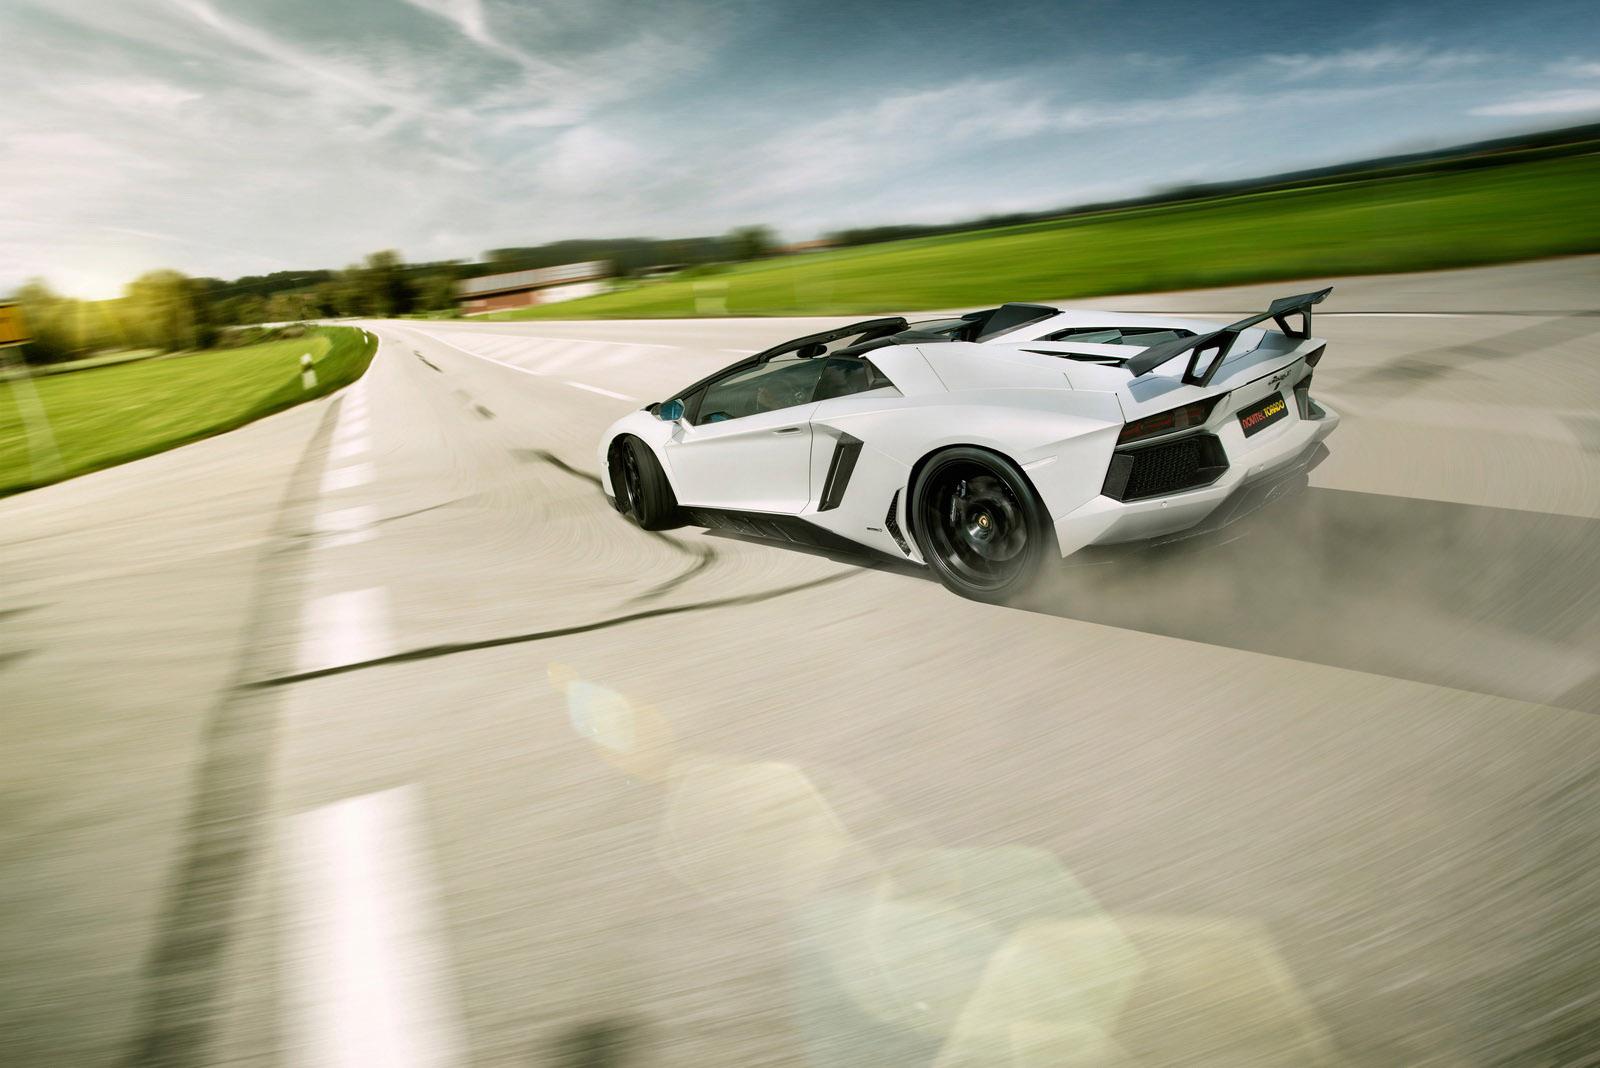 Novitec Torado на основе Lamborghini aventador LP 700-4 roadster